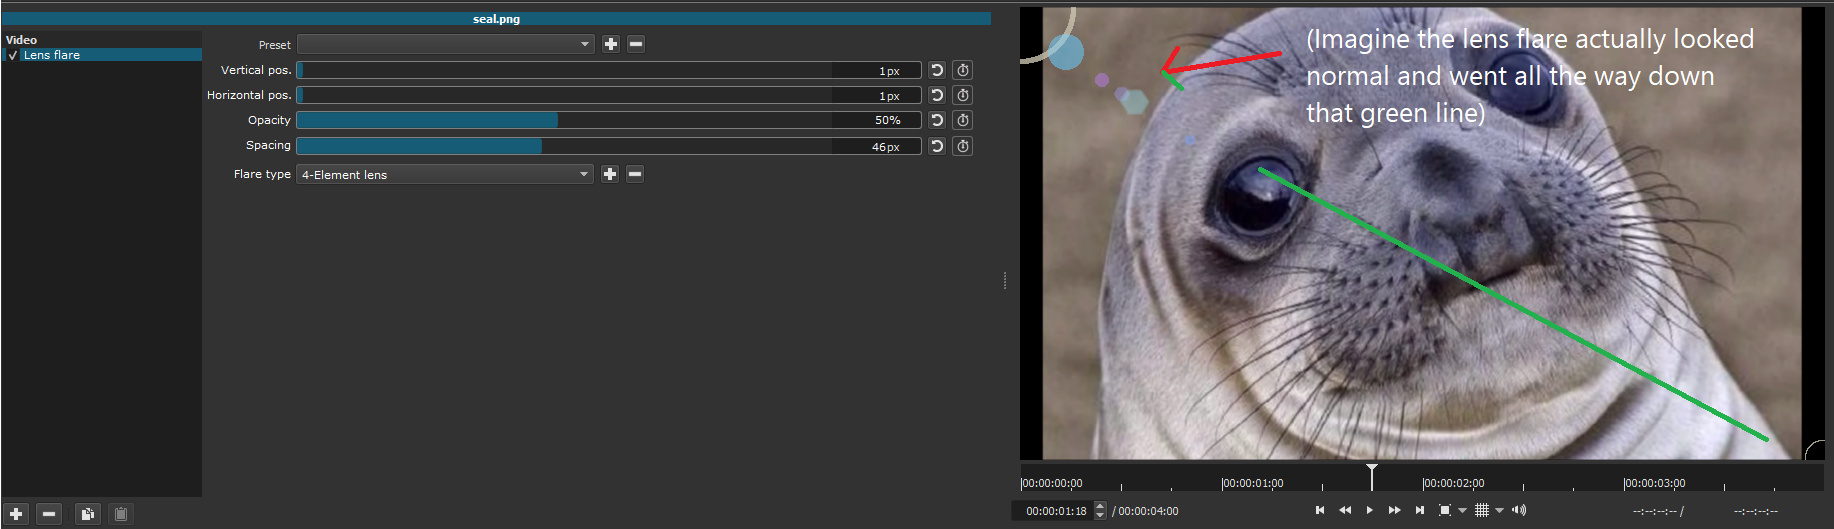 Lens flare filter - Suggestion - Shotcut Forum